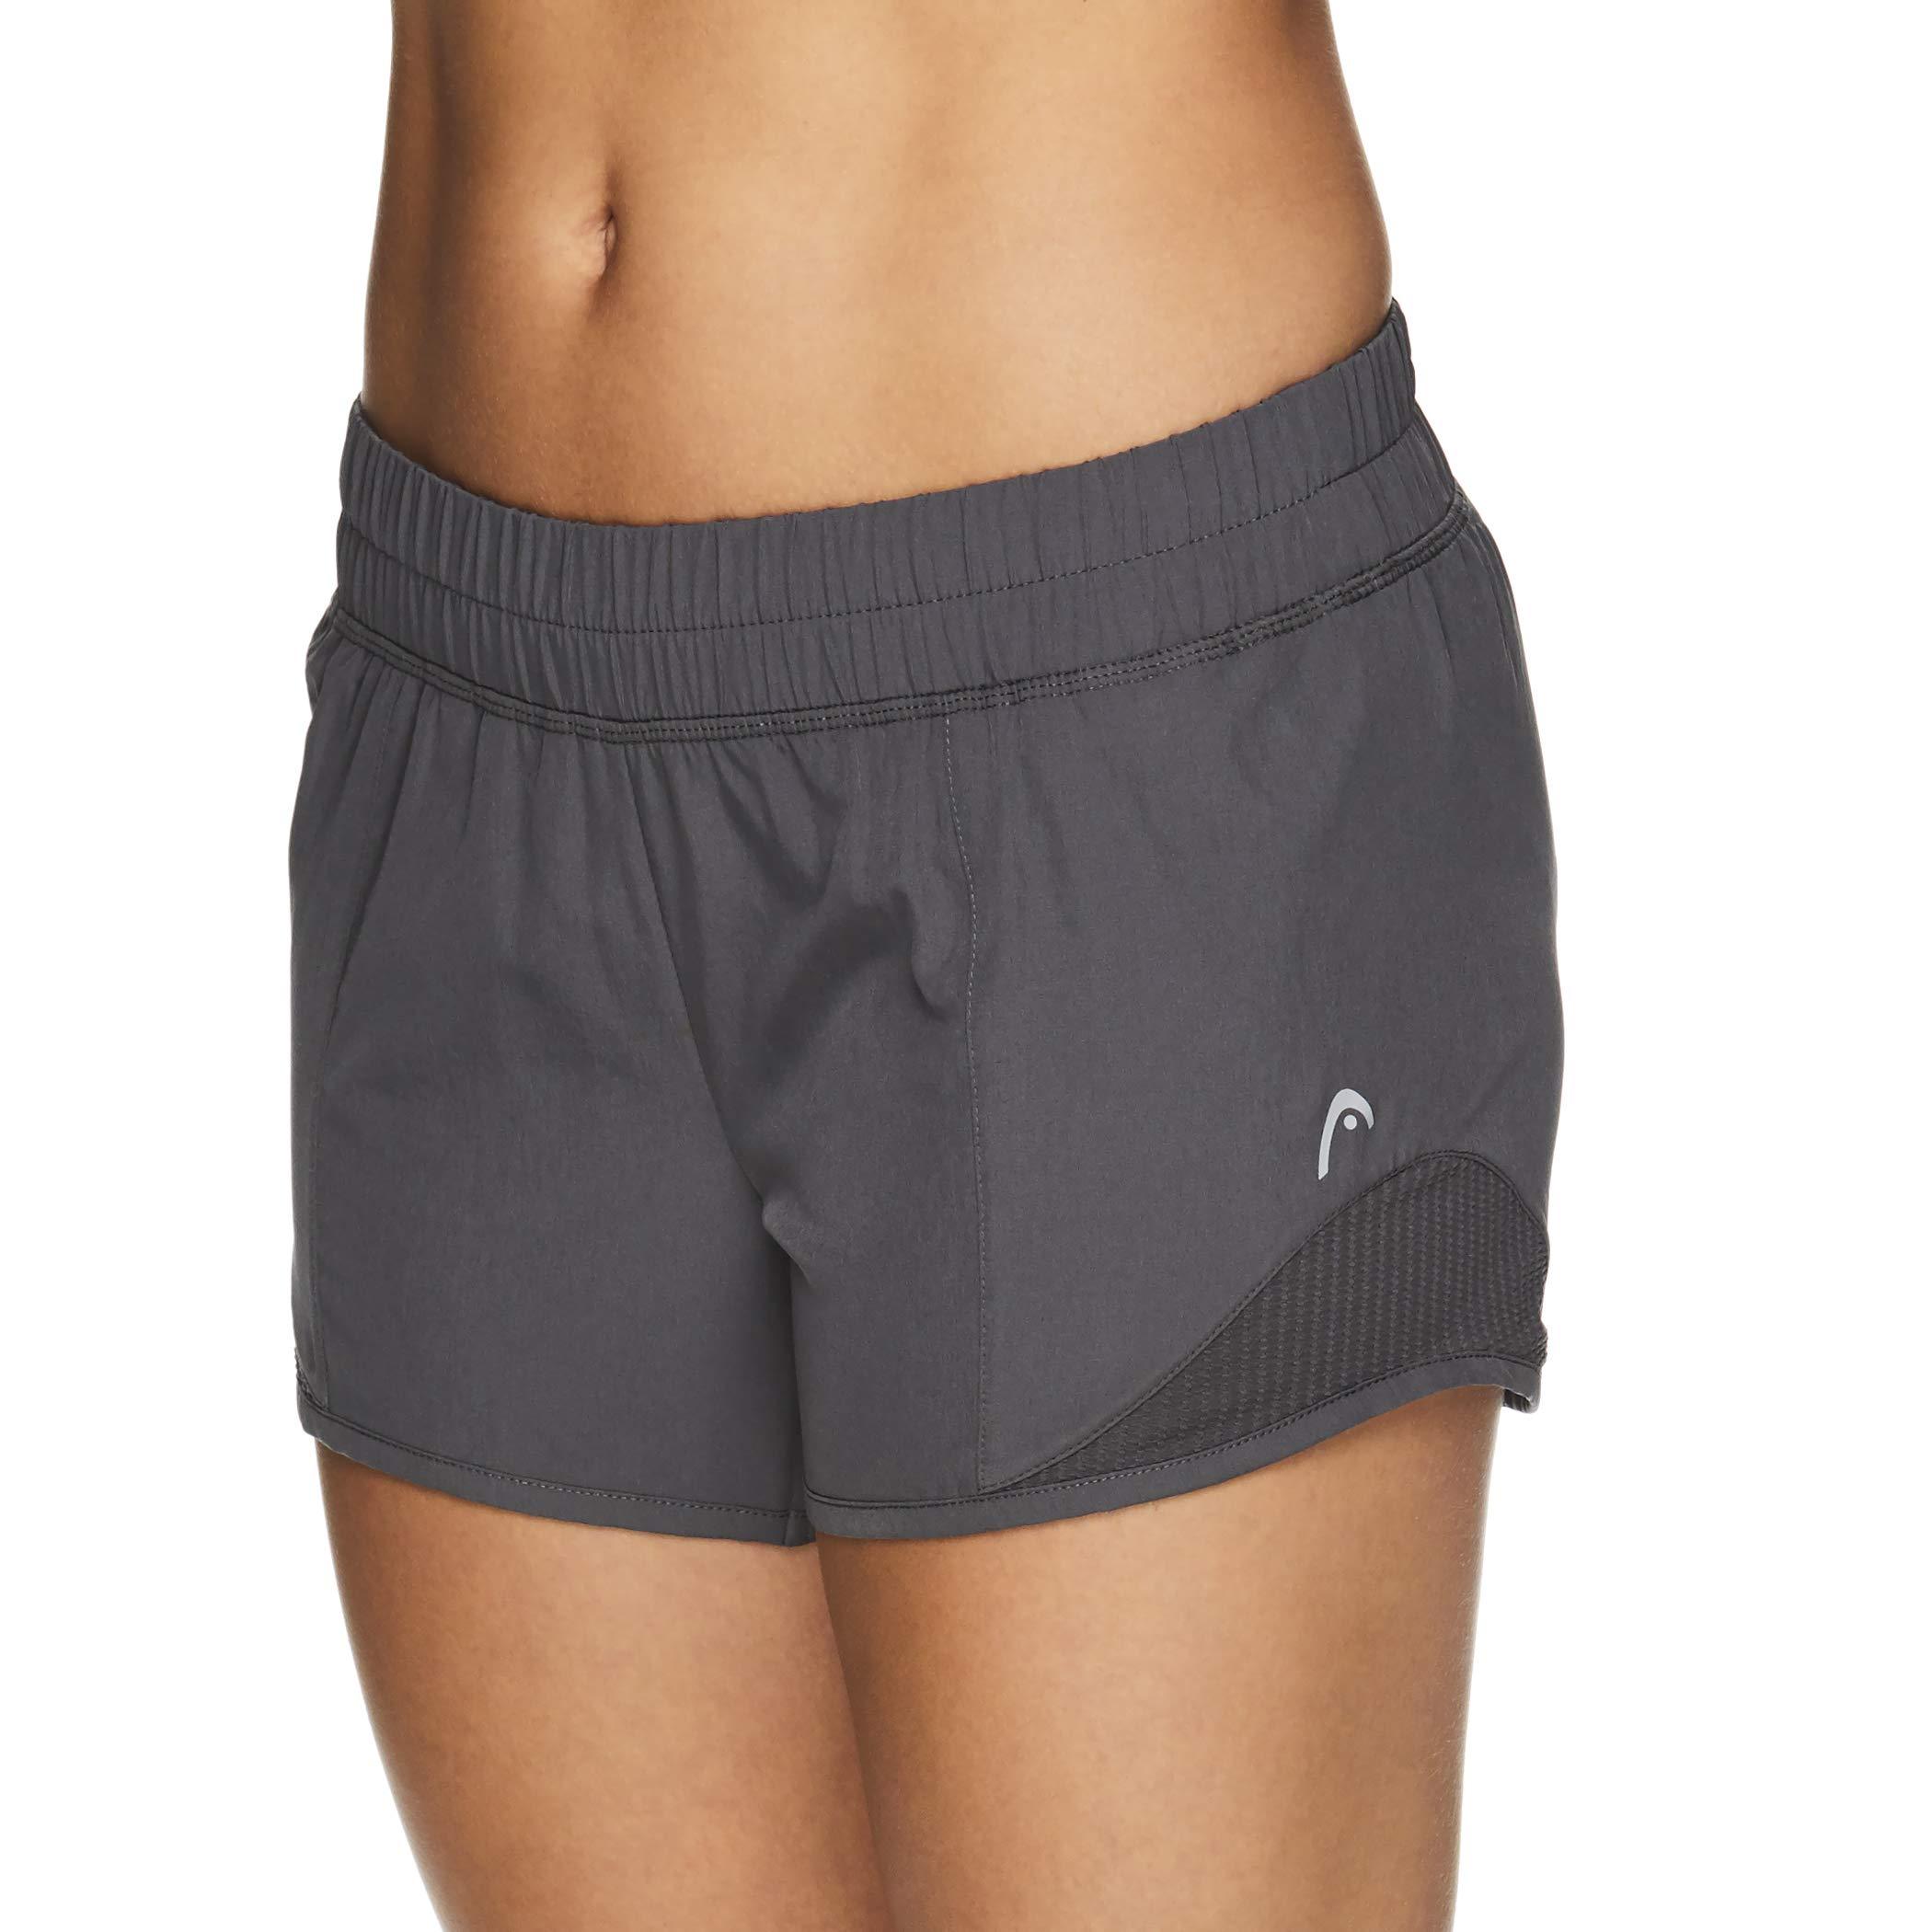 HEAD Women's Athletic Workout Shorts - Polyester Gym Training & Running Short - Partner Medium Grey, X-Small